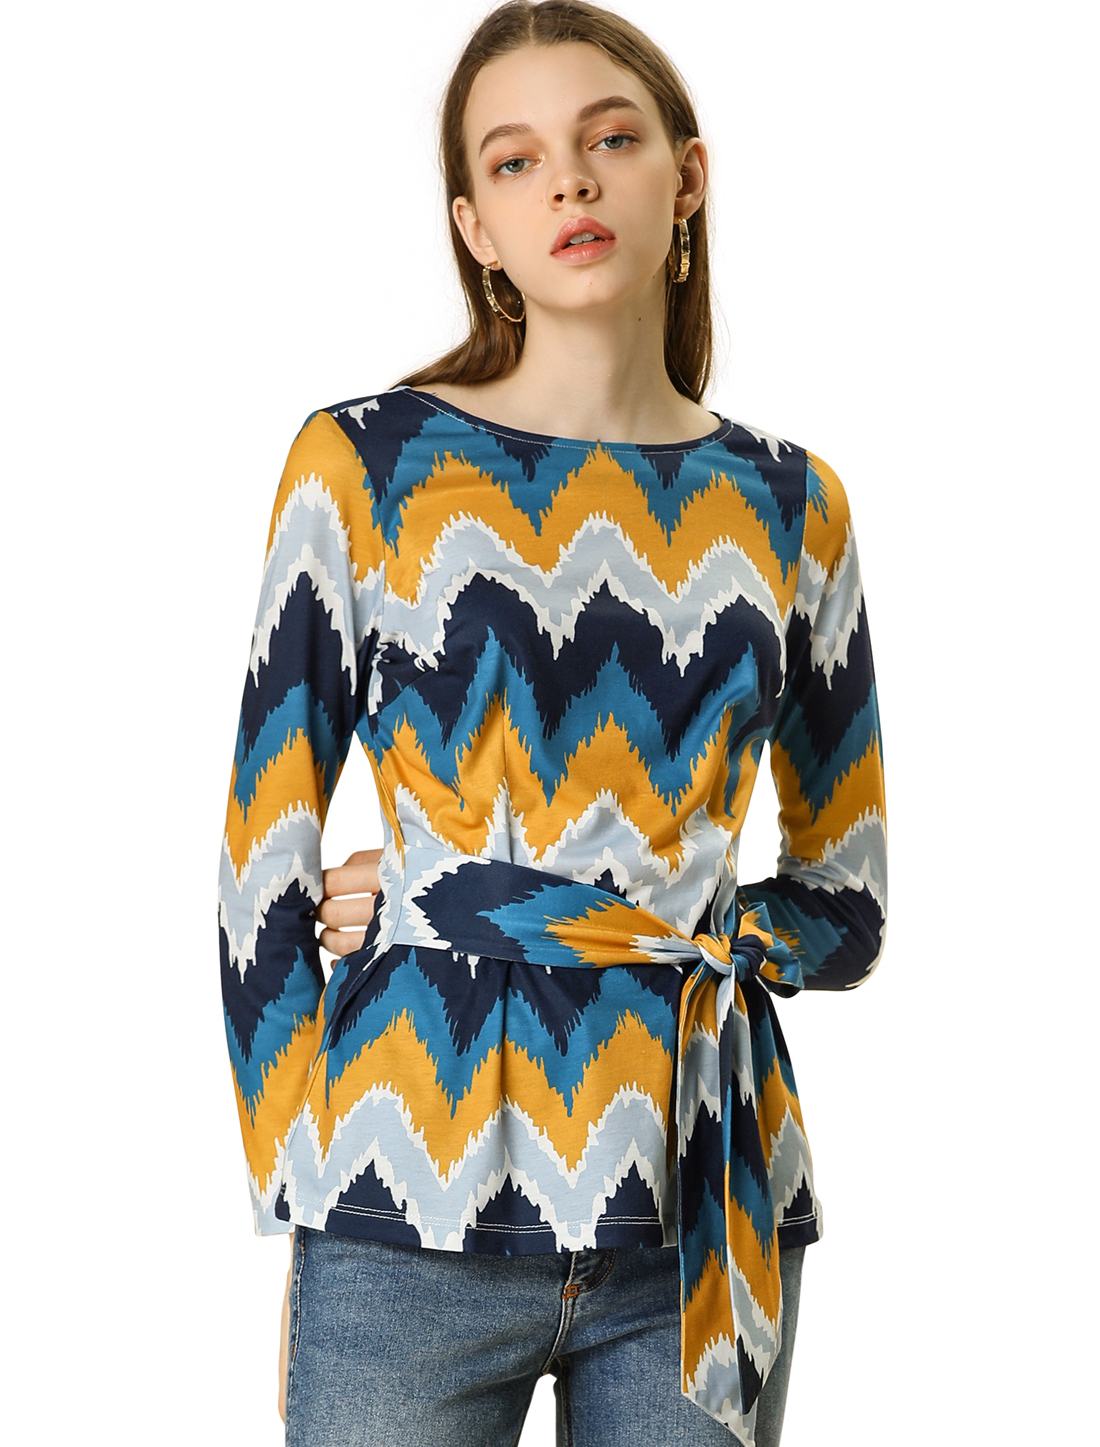 Allegra K Women's Zig-zag Pattern Round Neck Long Sleeve Belted Knit Top Blue M